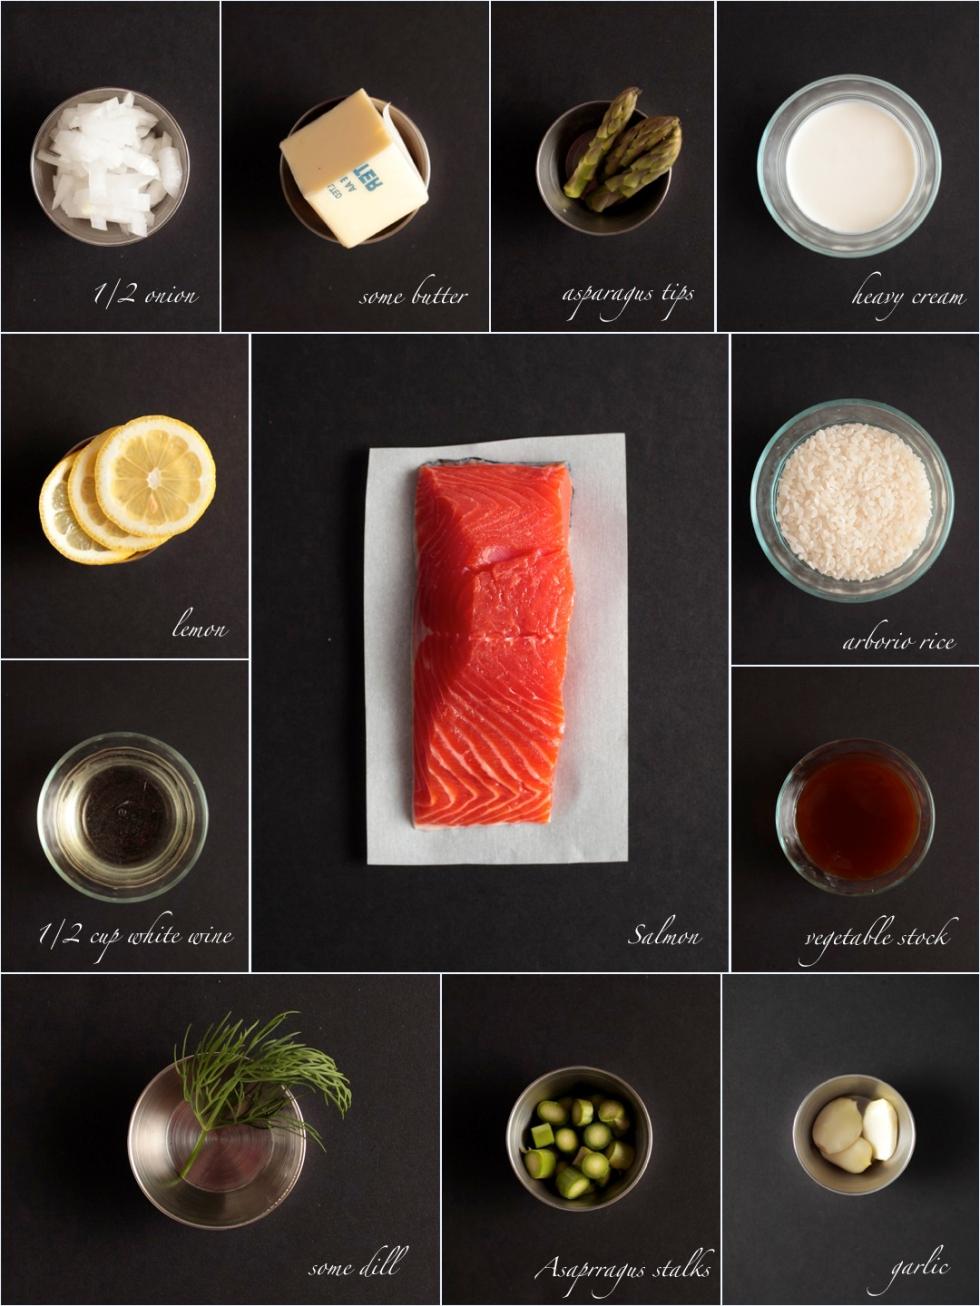 salmonRisottoIngredients